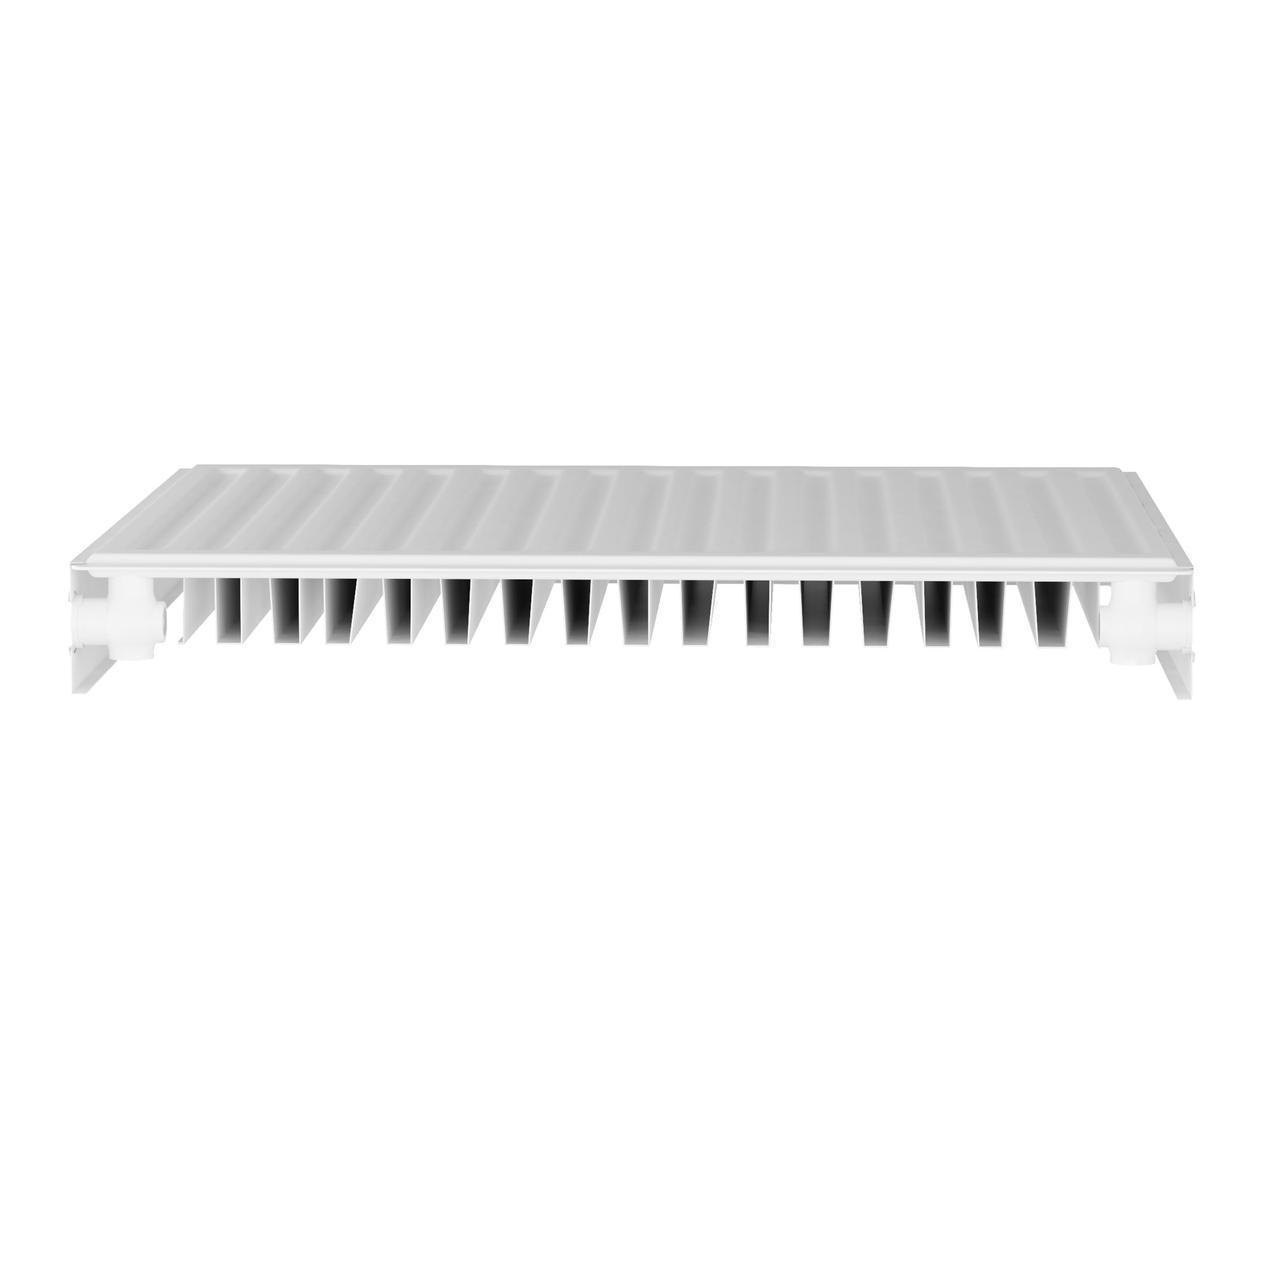 Радиатор Daylux класс 11 низ 500x1400 мм